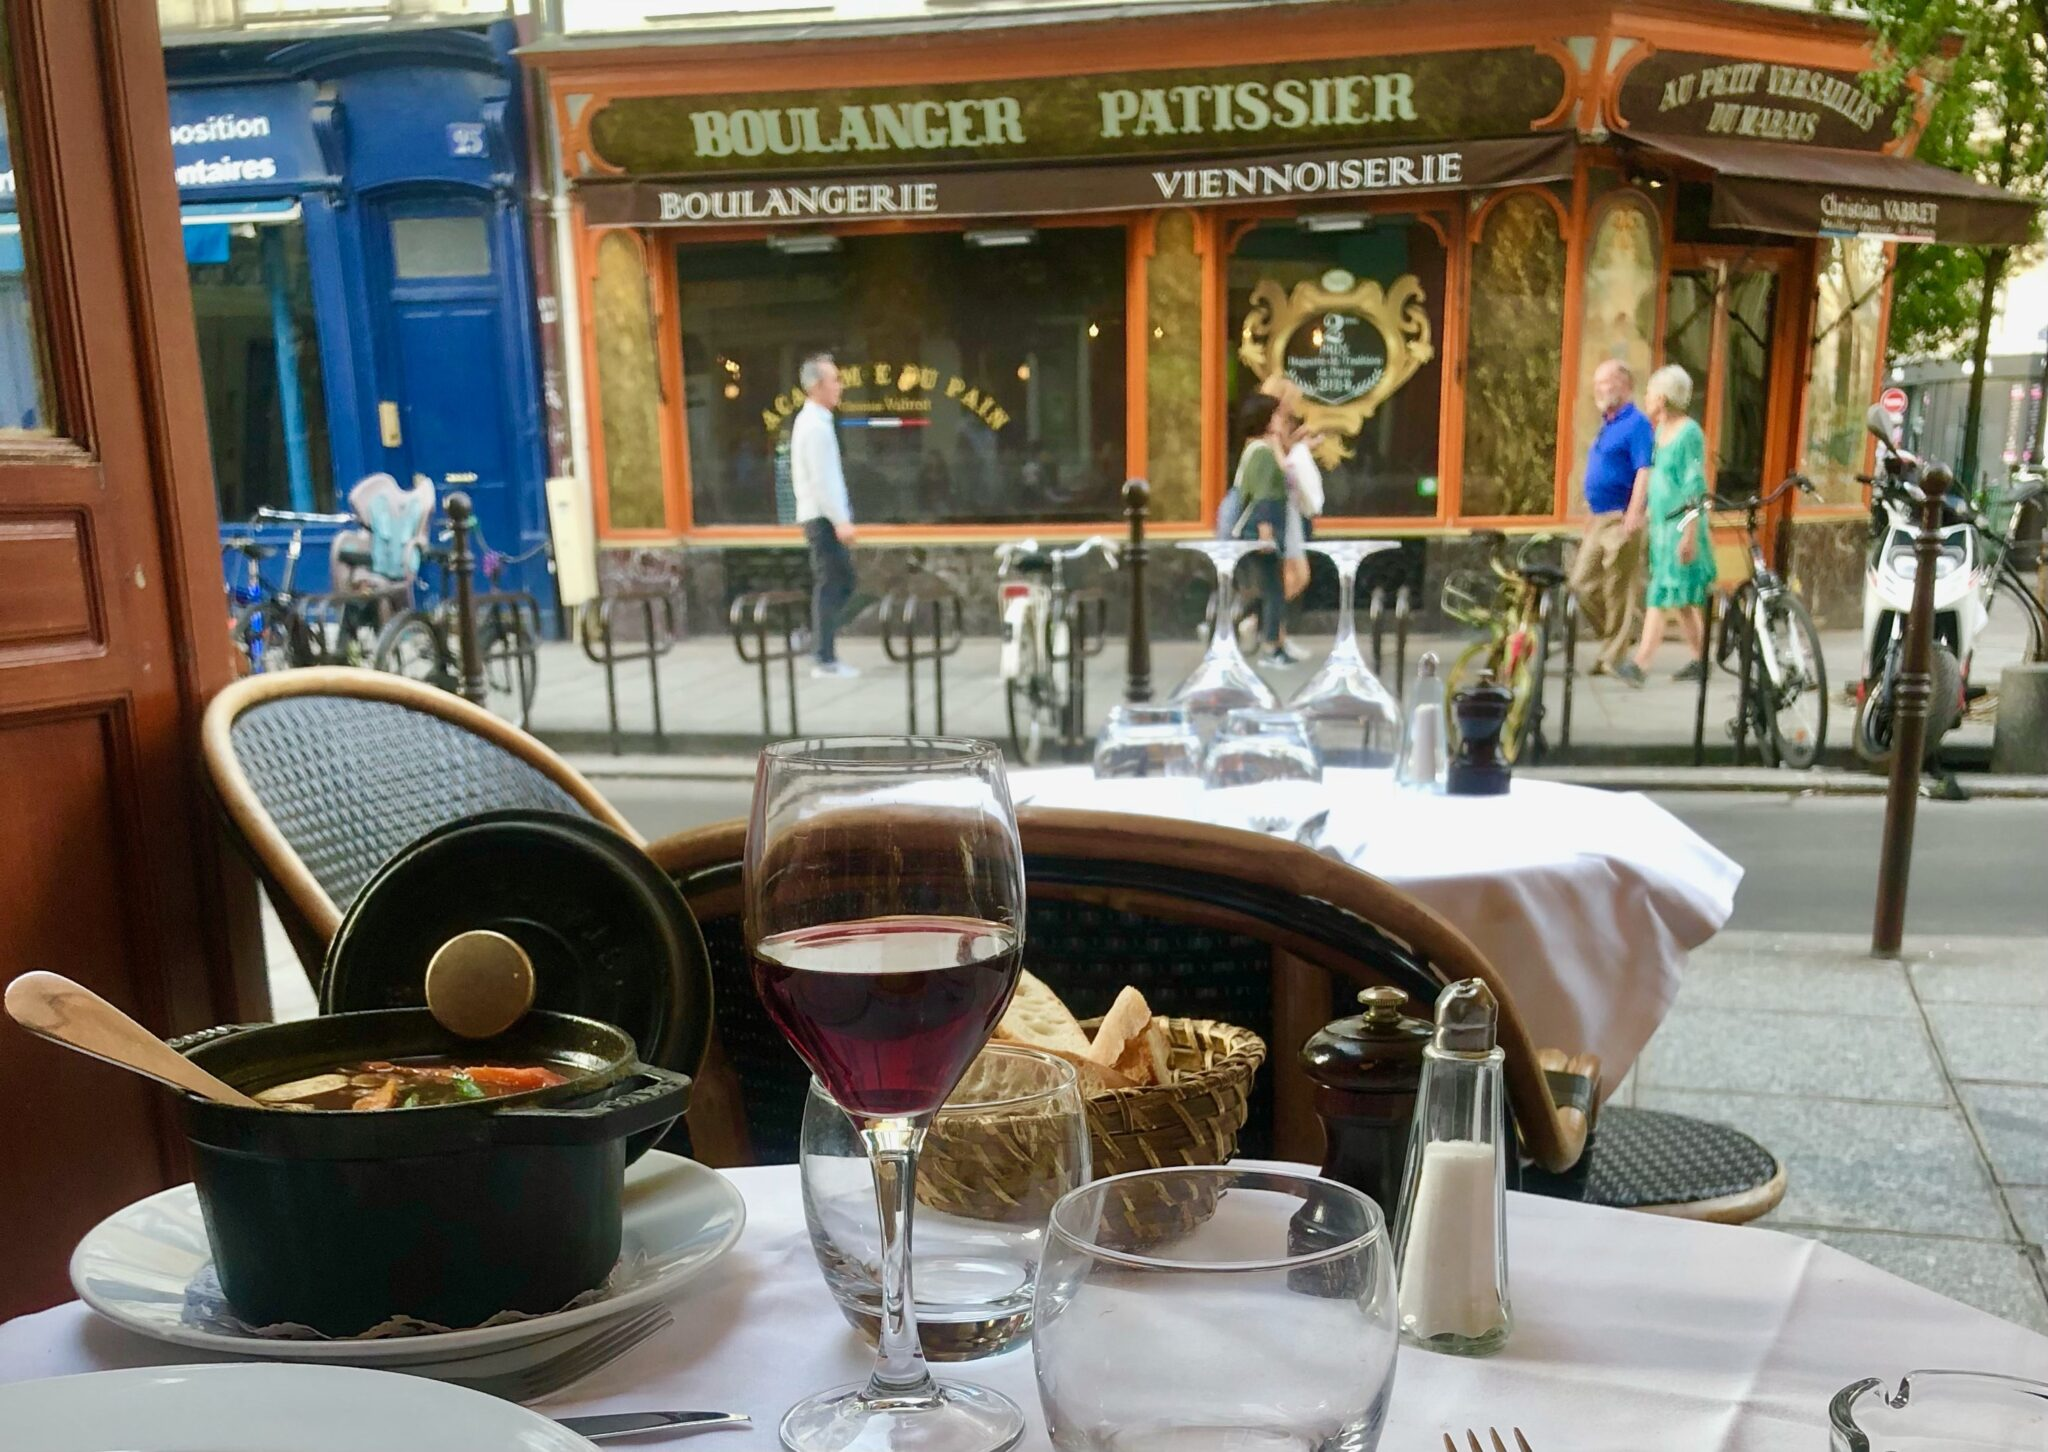 New Parisian wine bar + kitchen coming to Birmingham in 2022